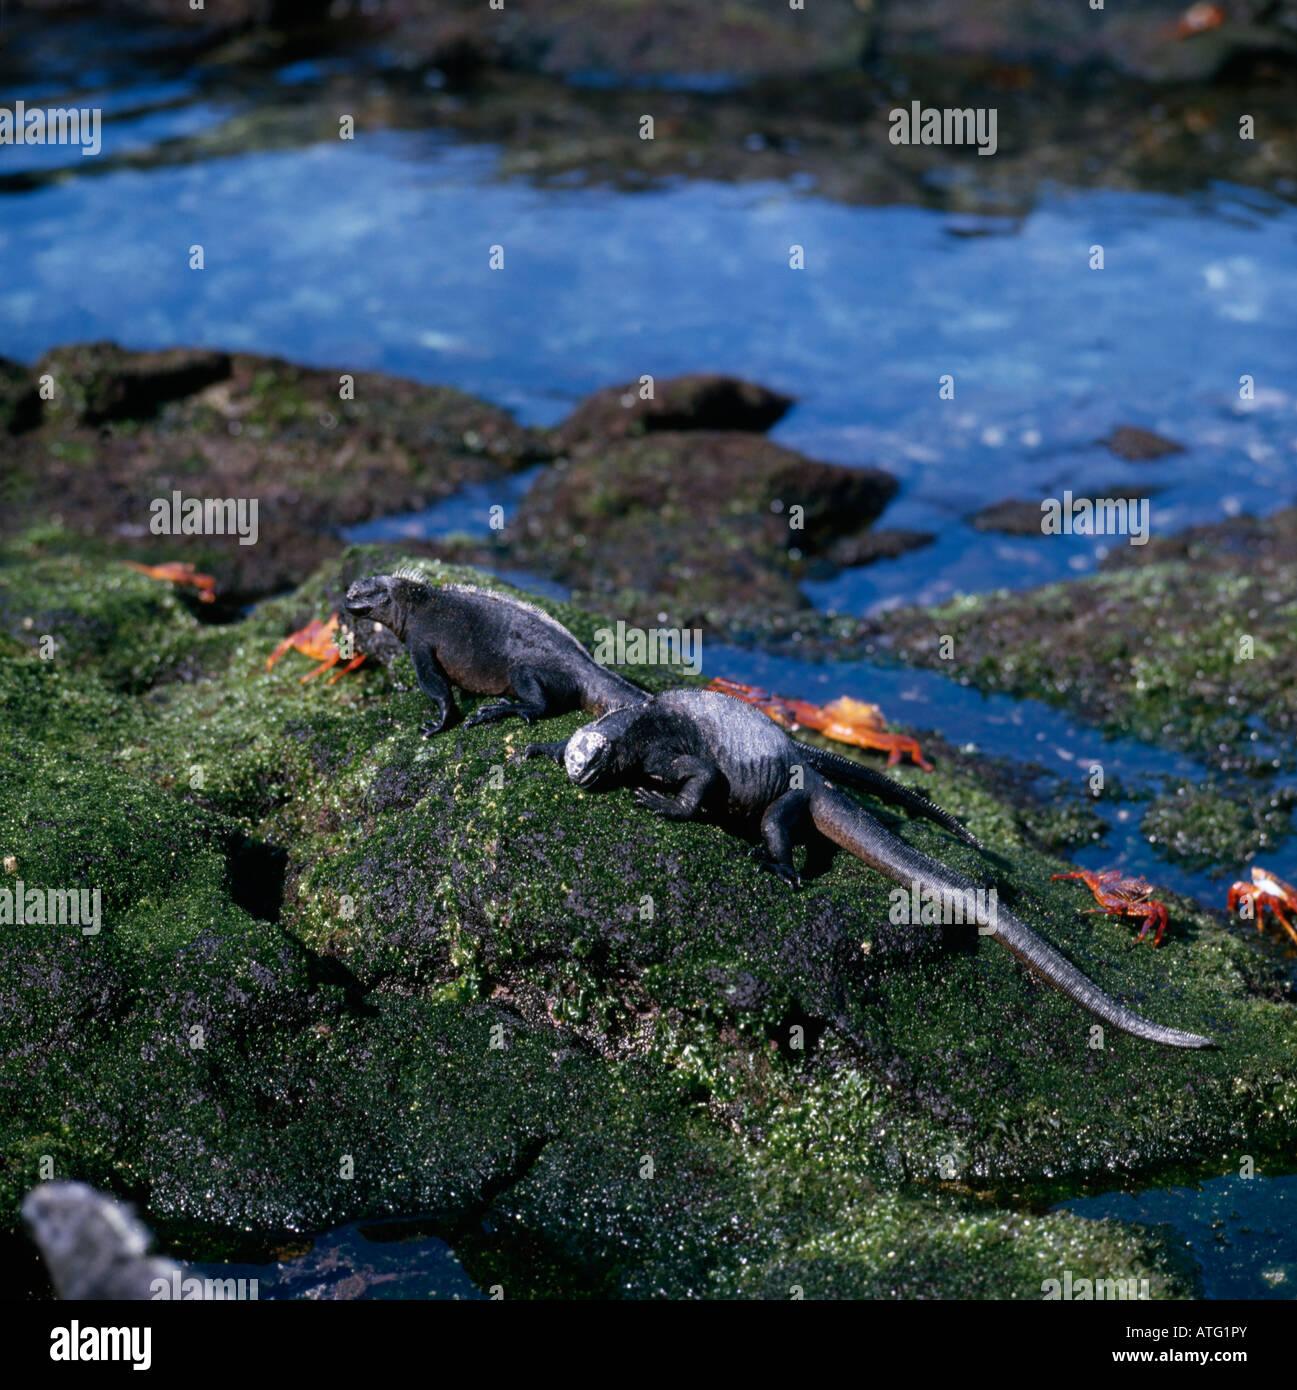 beschaulicher Marins Meerechsen marinen Leguane Amblyrhinchus Cristatus Sonnenbaden Galapagos Tiere porträtiert Stockbild